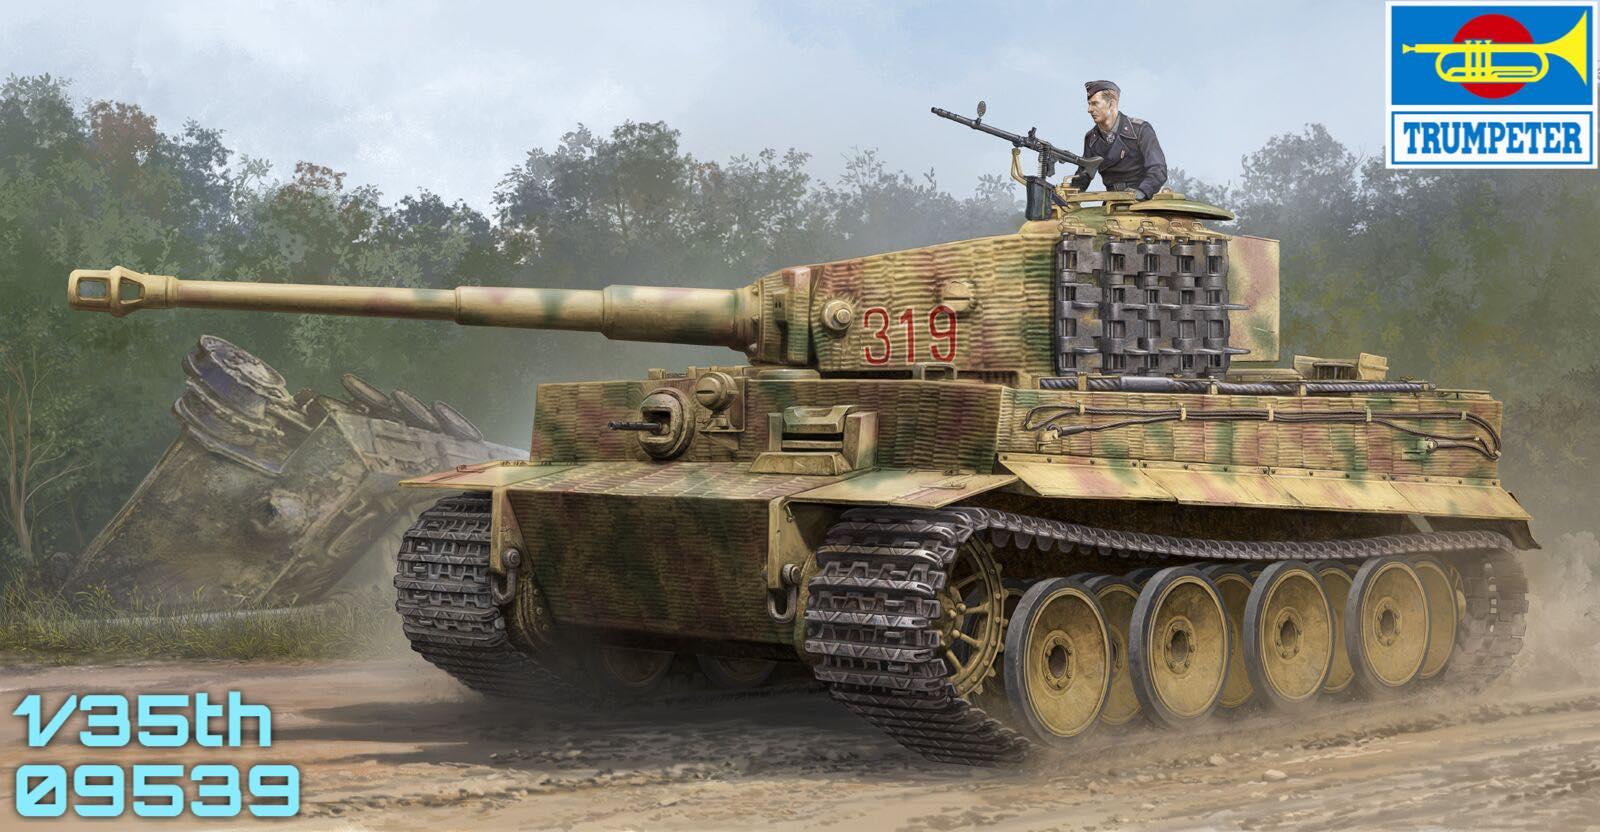 Trumpeter Tiger  Build